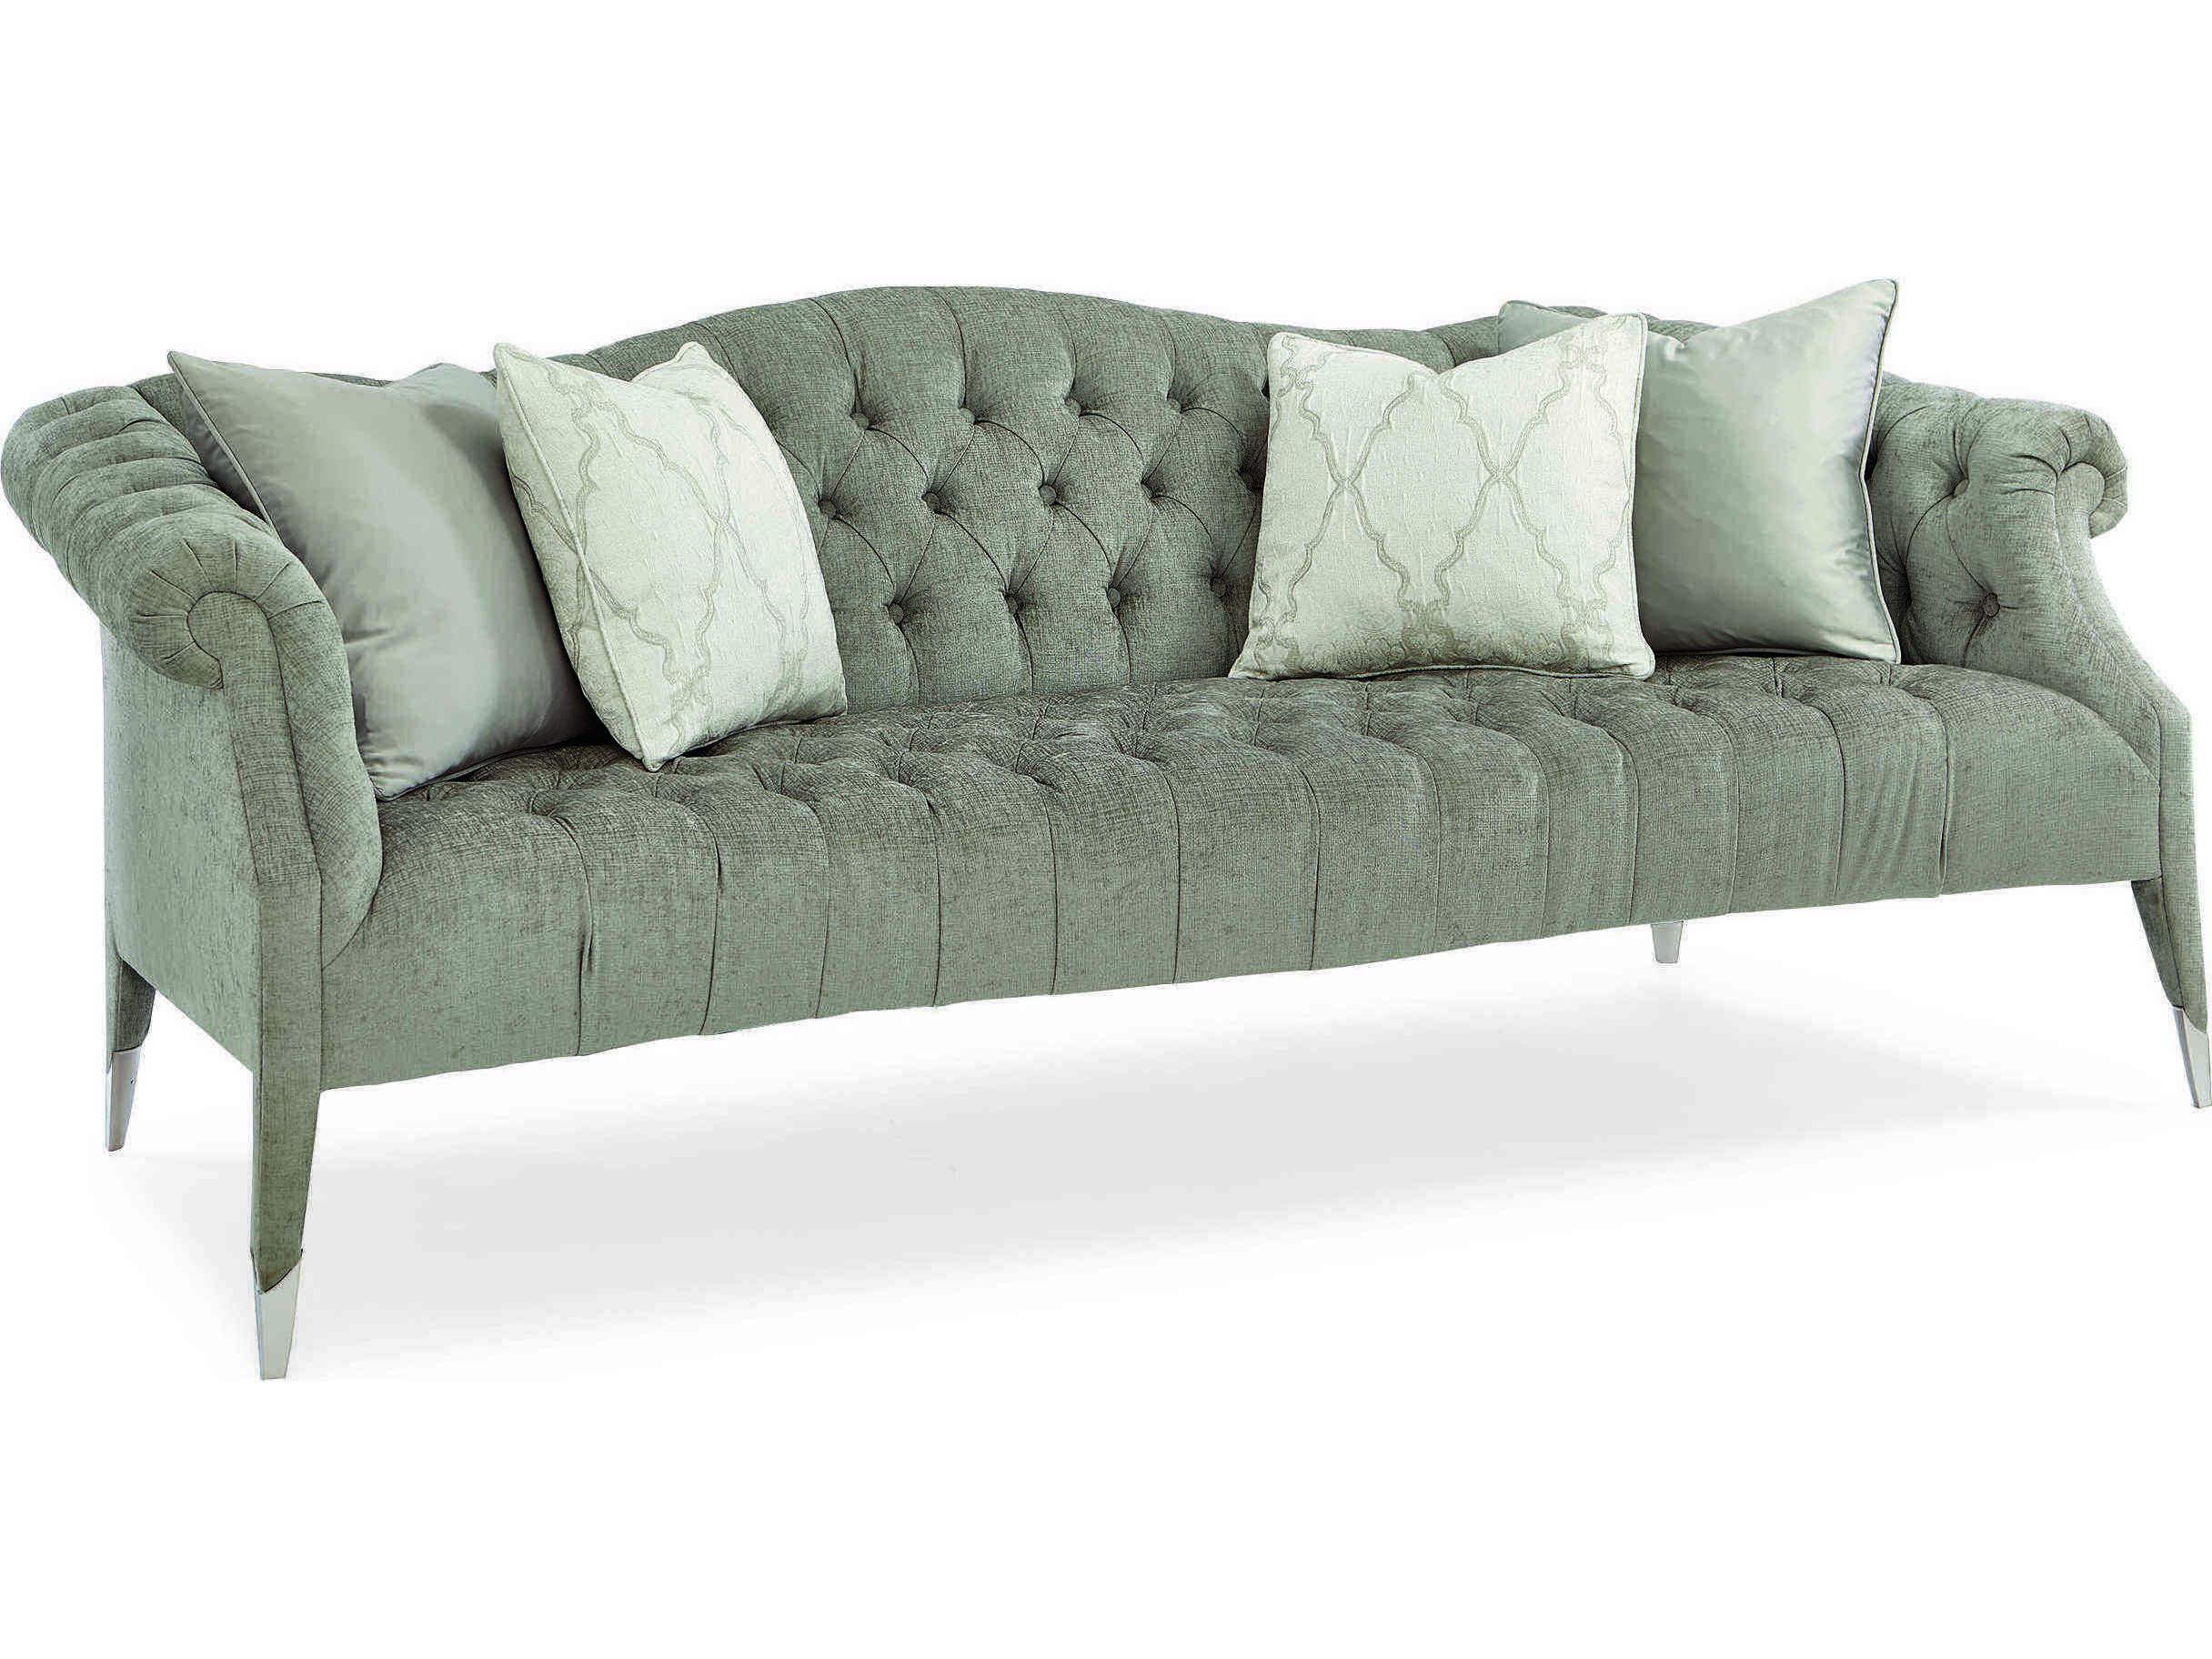 Caracole Classic Soft Brushed Grey Tufted Sofa